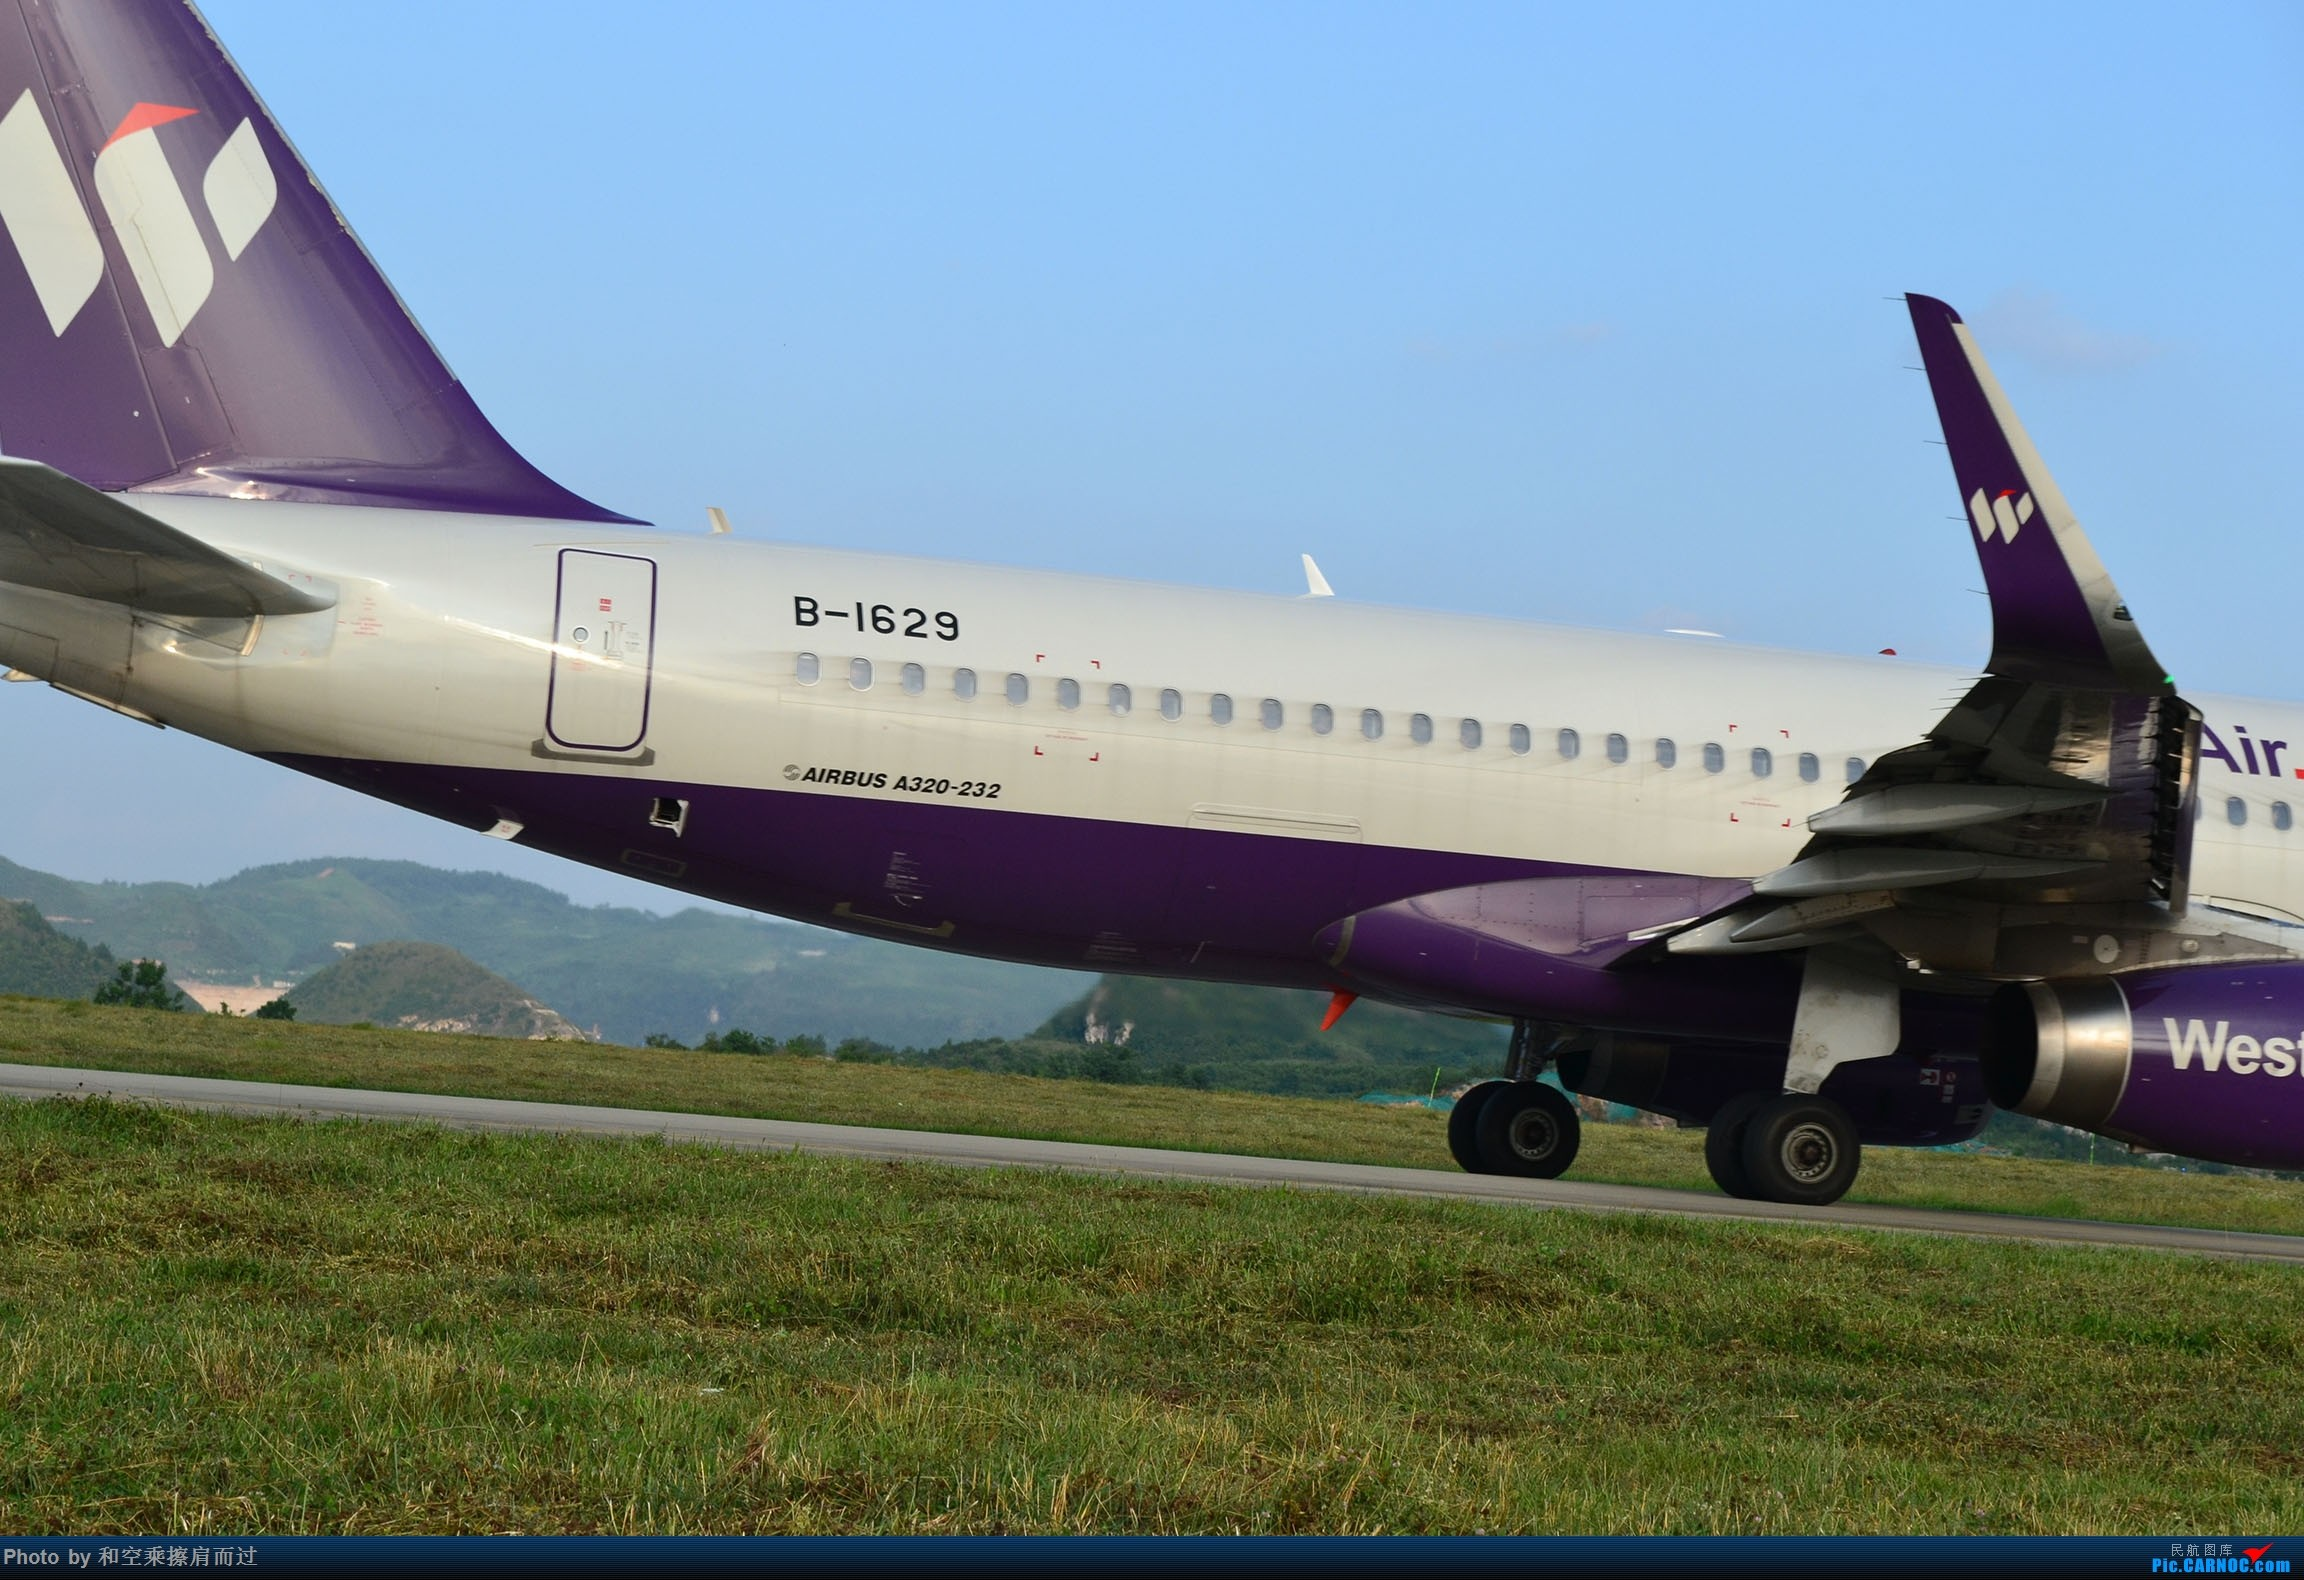 Re:[原创]【KWE】七月六日晴 KWE冒险打机 AIRBUS A320-200 B-1629 中国贵阳龙洞堡国际机场